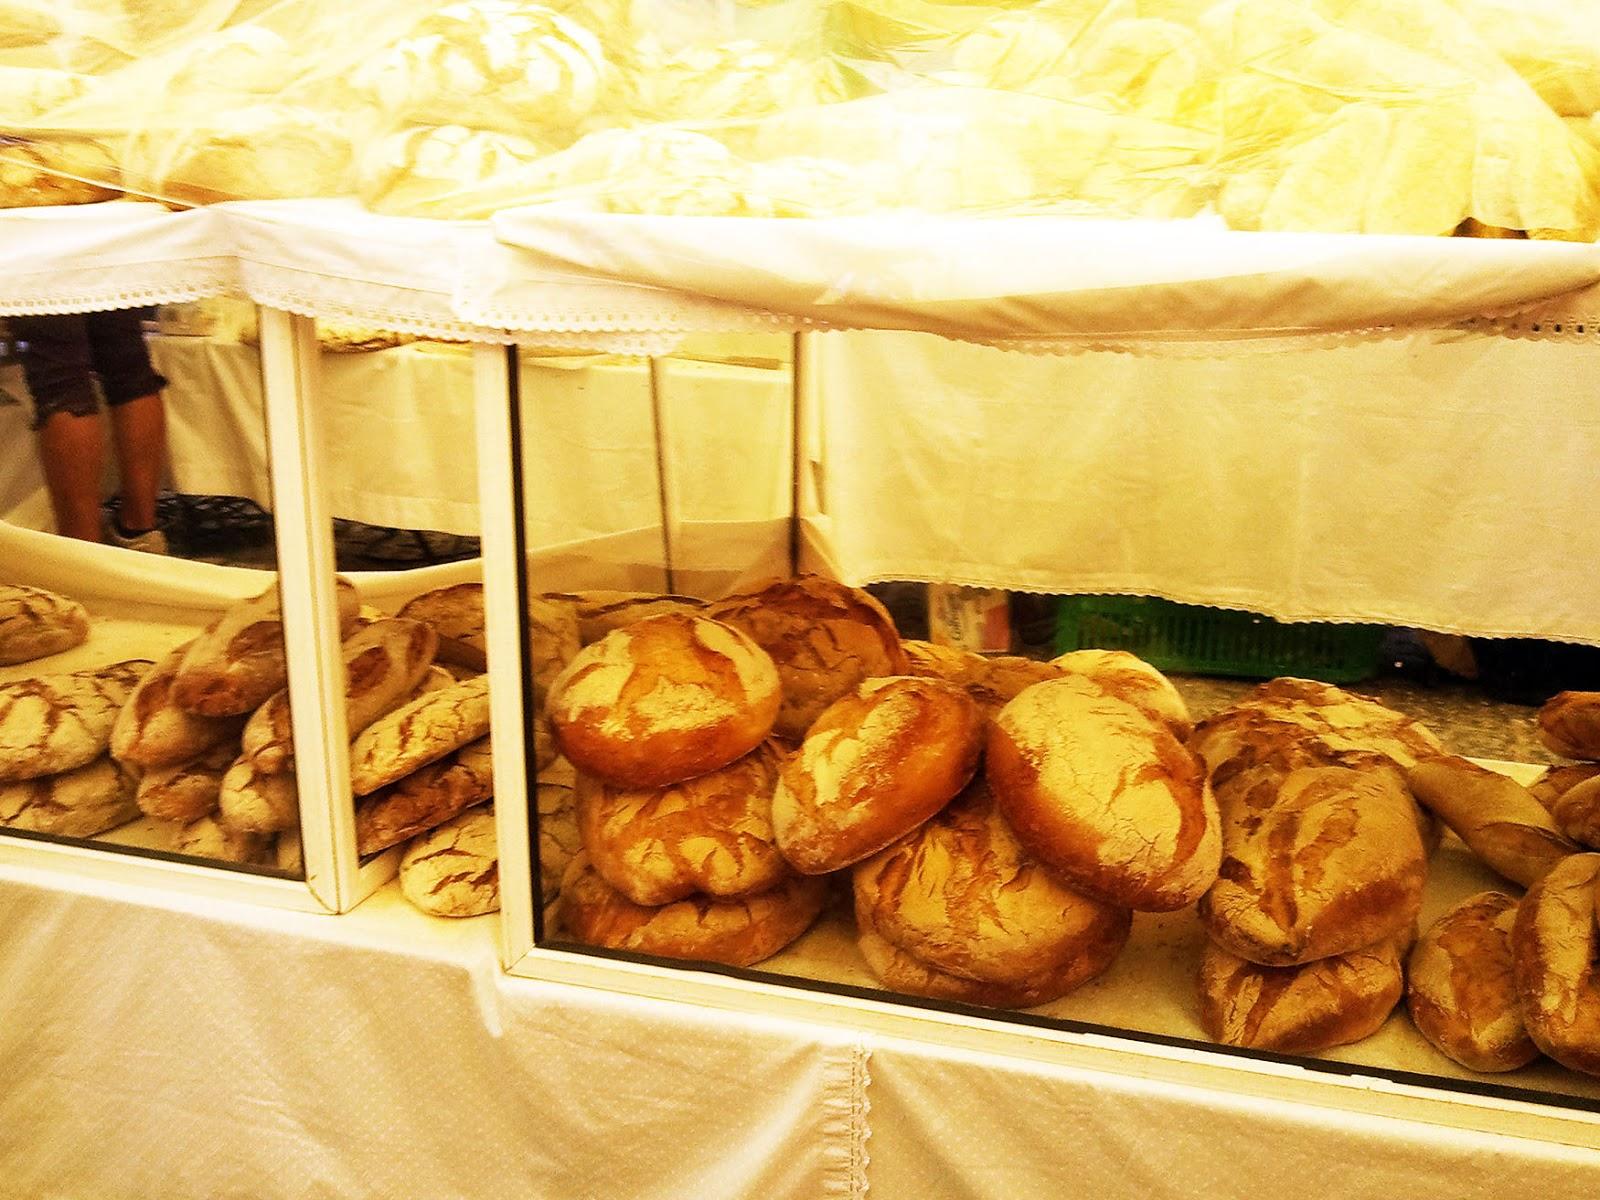 Banca de pão